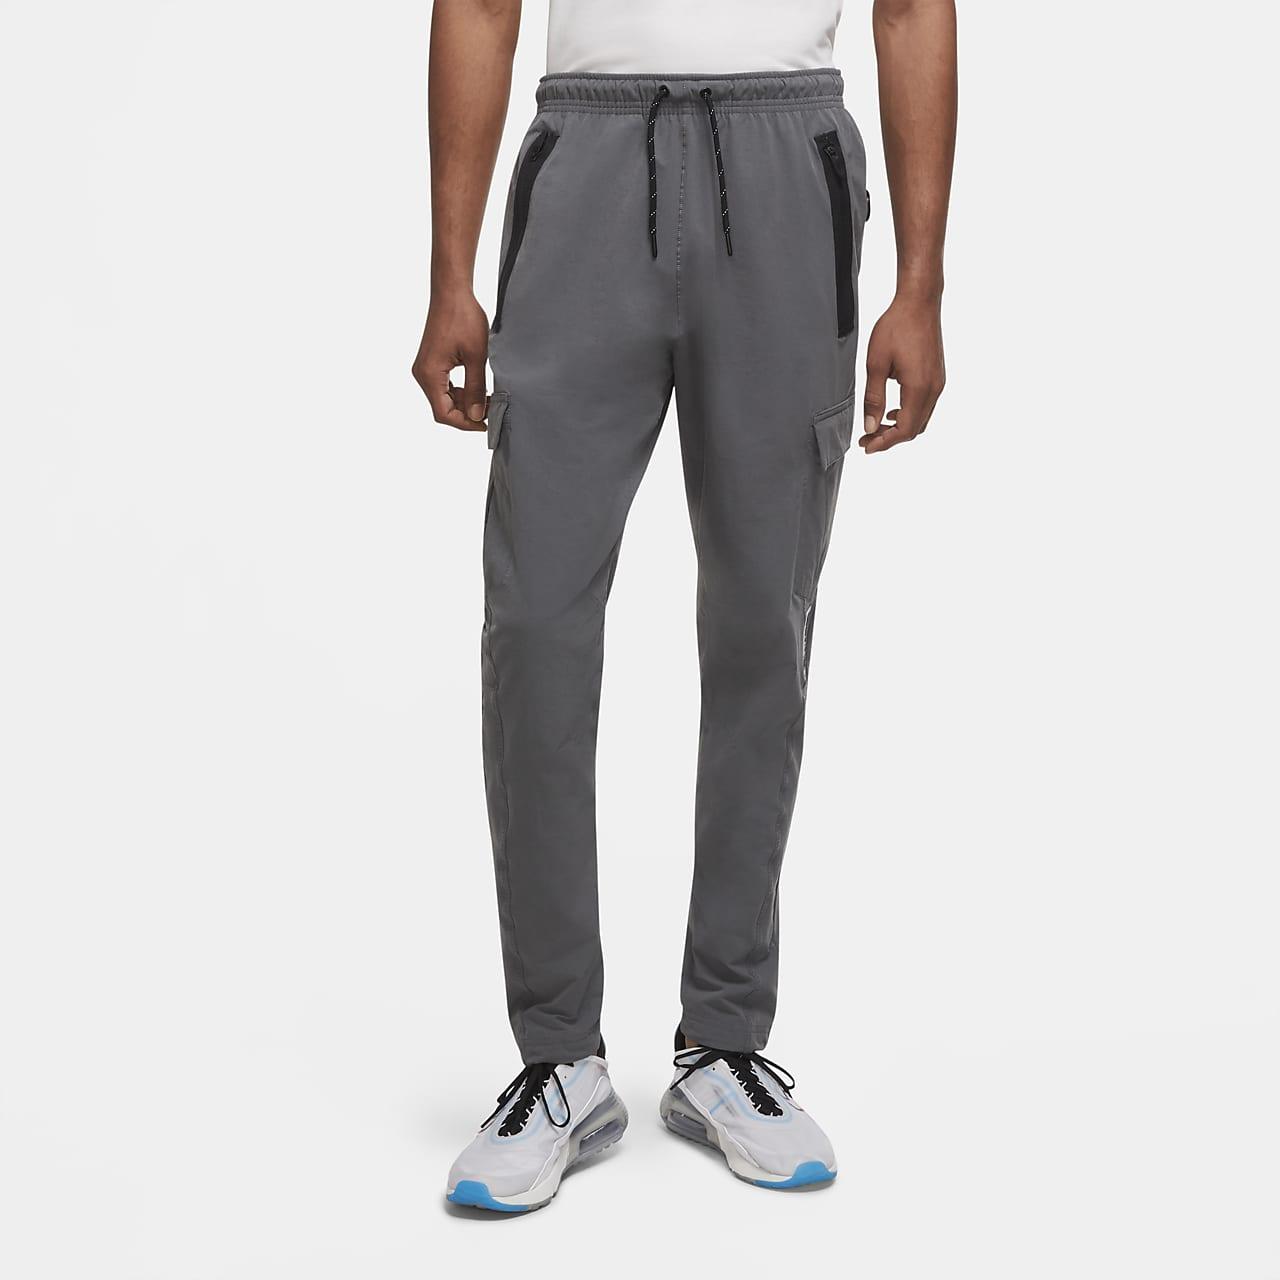 Pantalon cargo tissé Nike Sportswear Air Max pour Homme